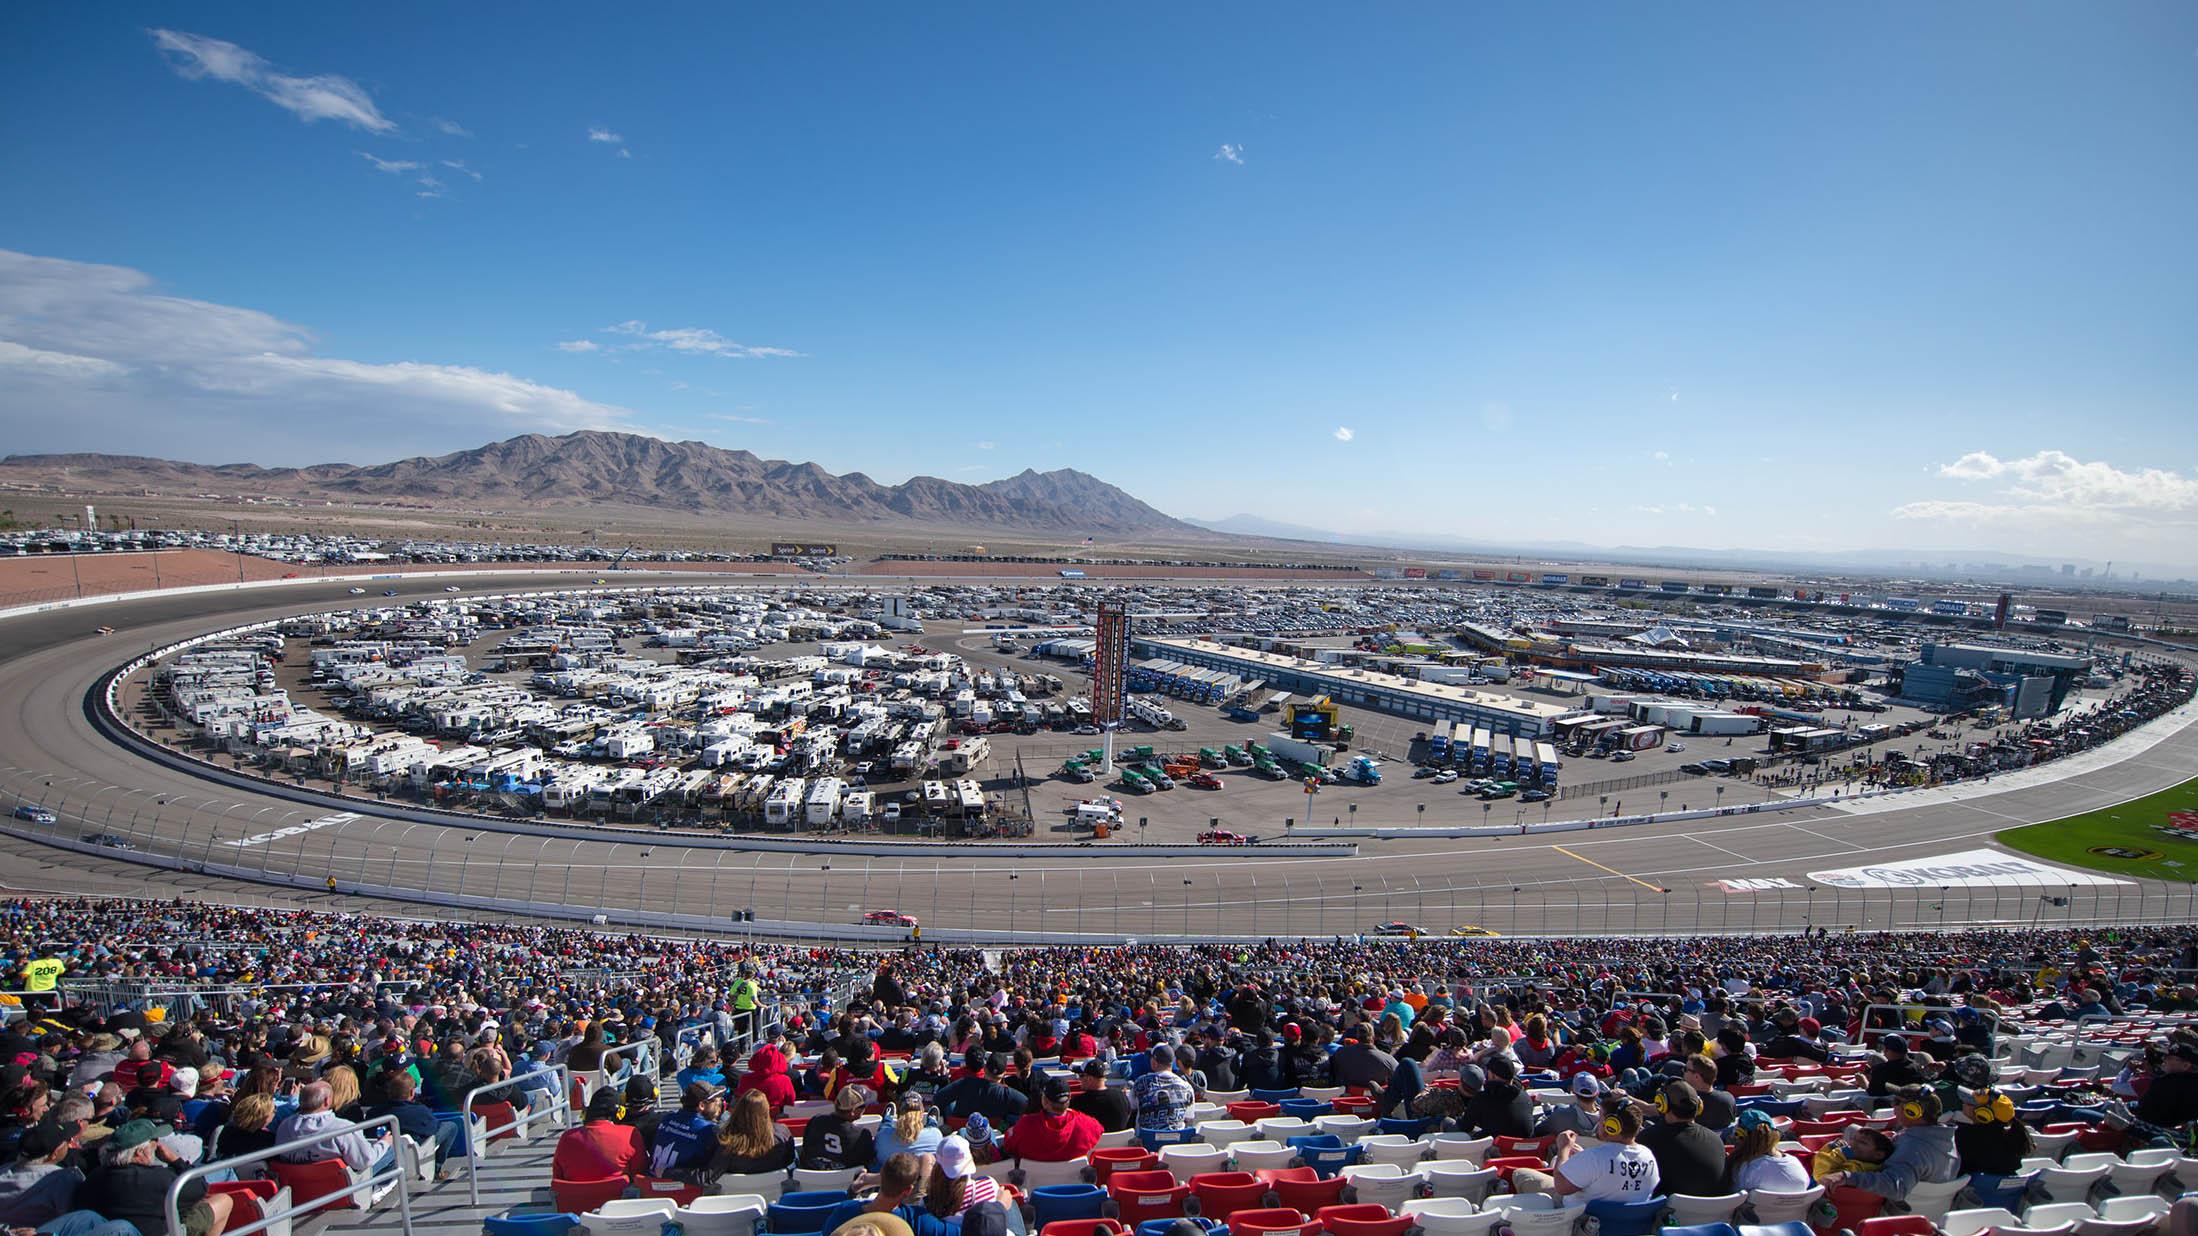 Mar 6, 2016; Las Vegas, NV, USA; Fans look on during the Kobalt 400 at Las Vegas Motor Speedway. Mandatory Credit: Stephen R. Sylvanie-USA TODAY Sports